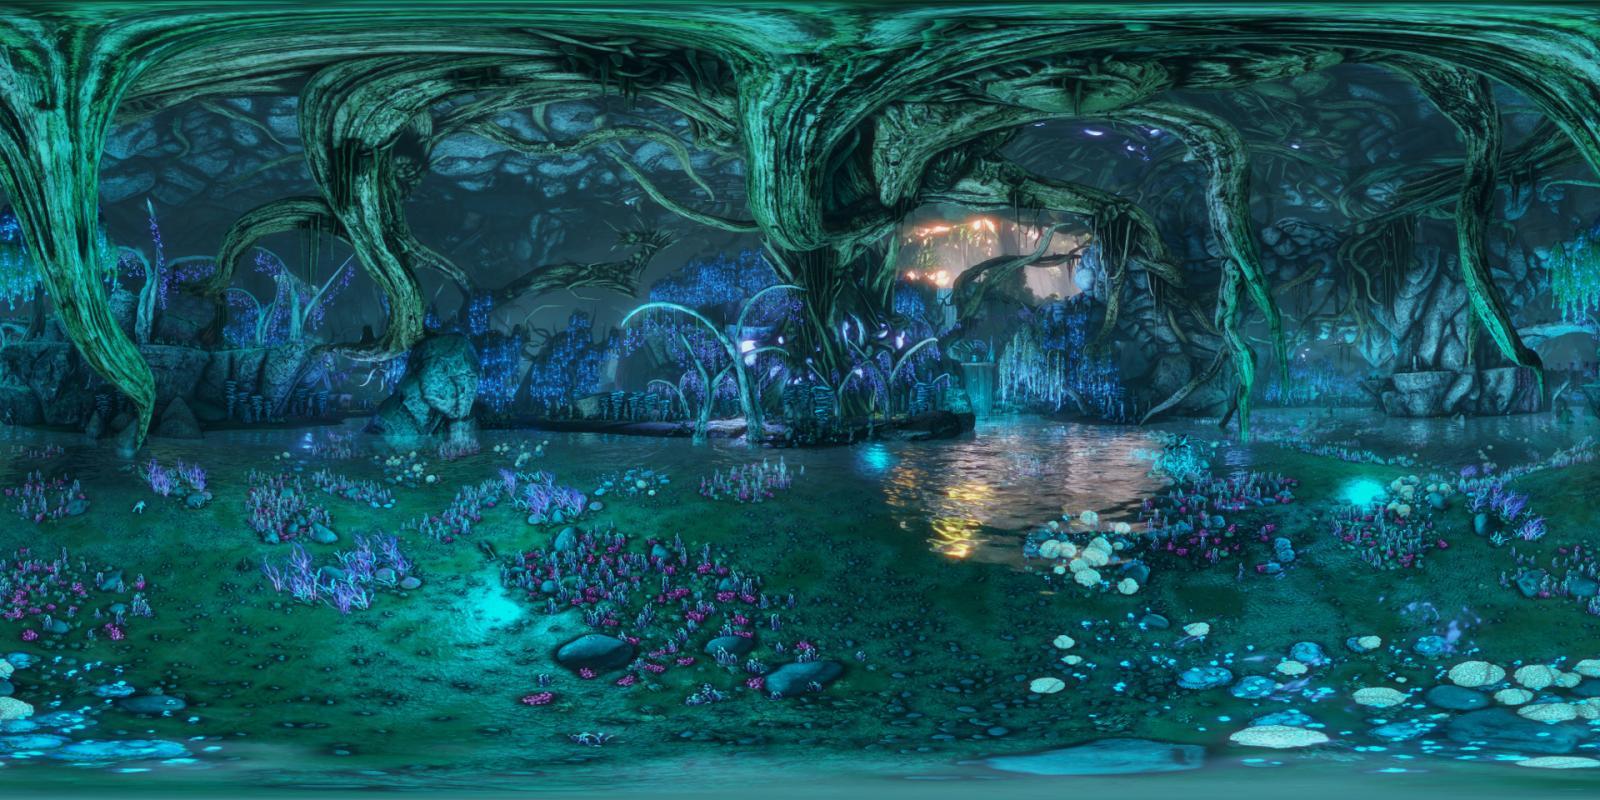 large.5a3da3c2df193_roguewolf91-SubterraneanSerenity-Panoramic360Stereoscopic3D.jpg